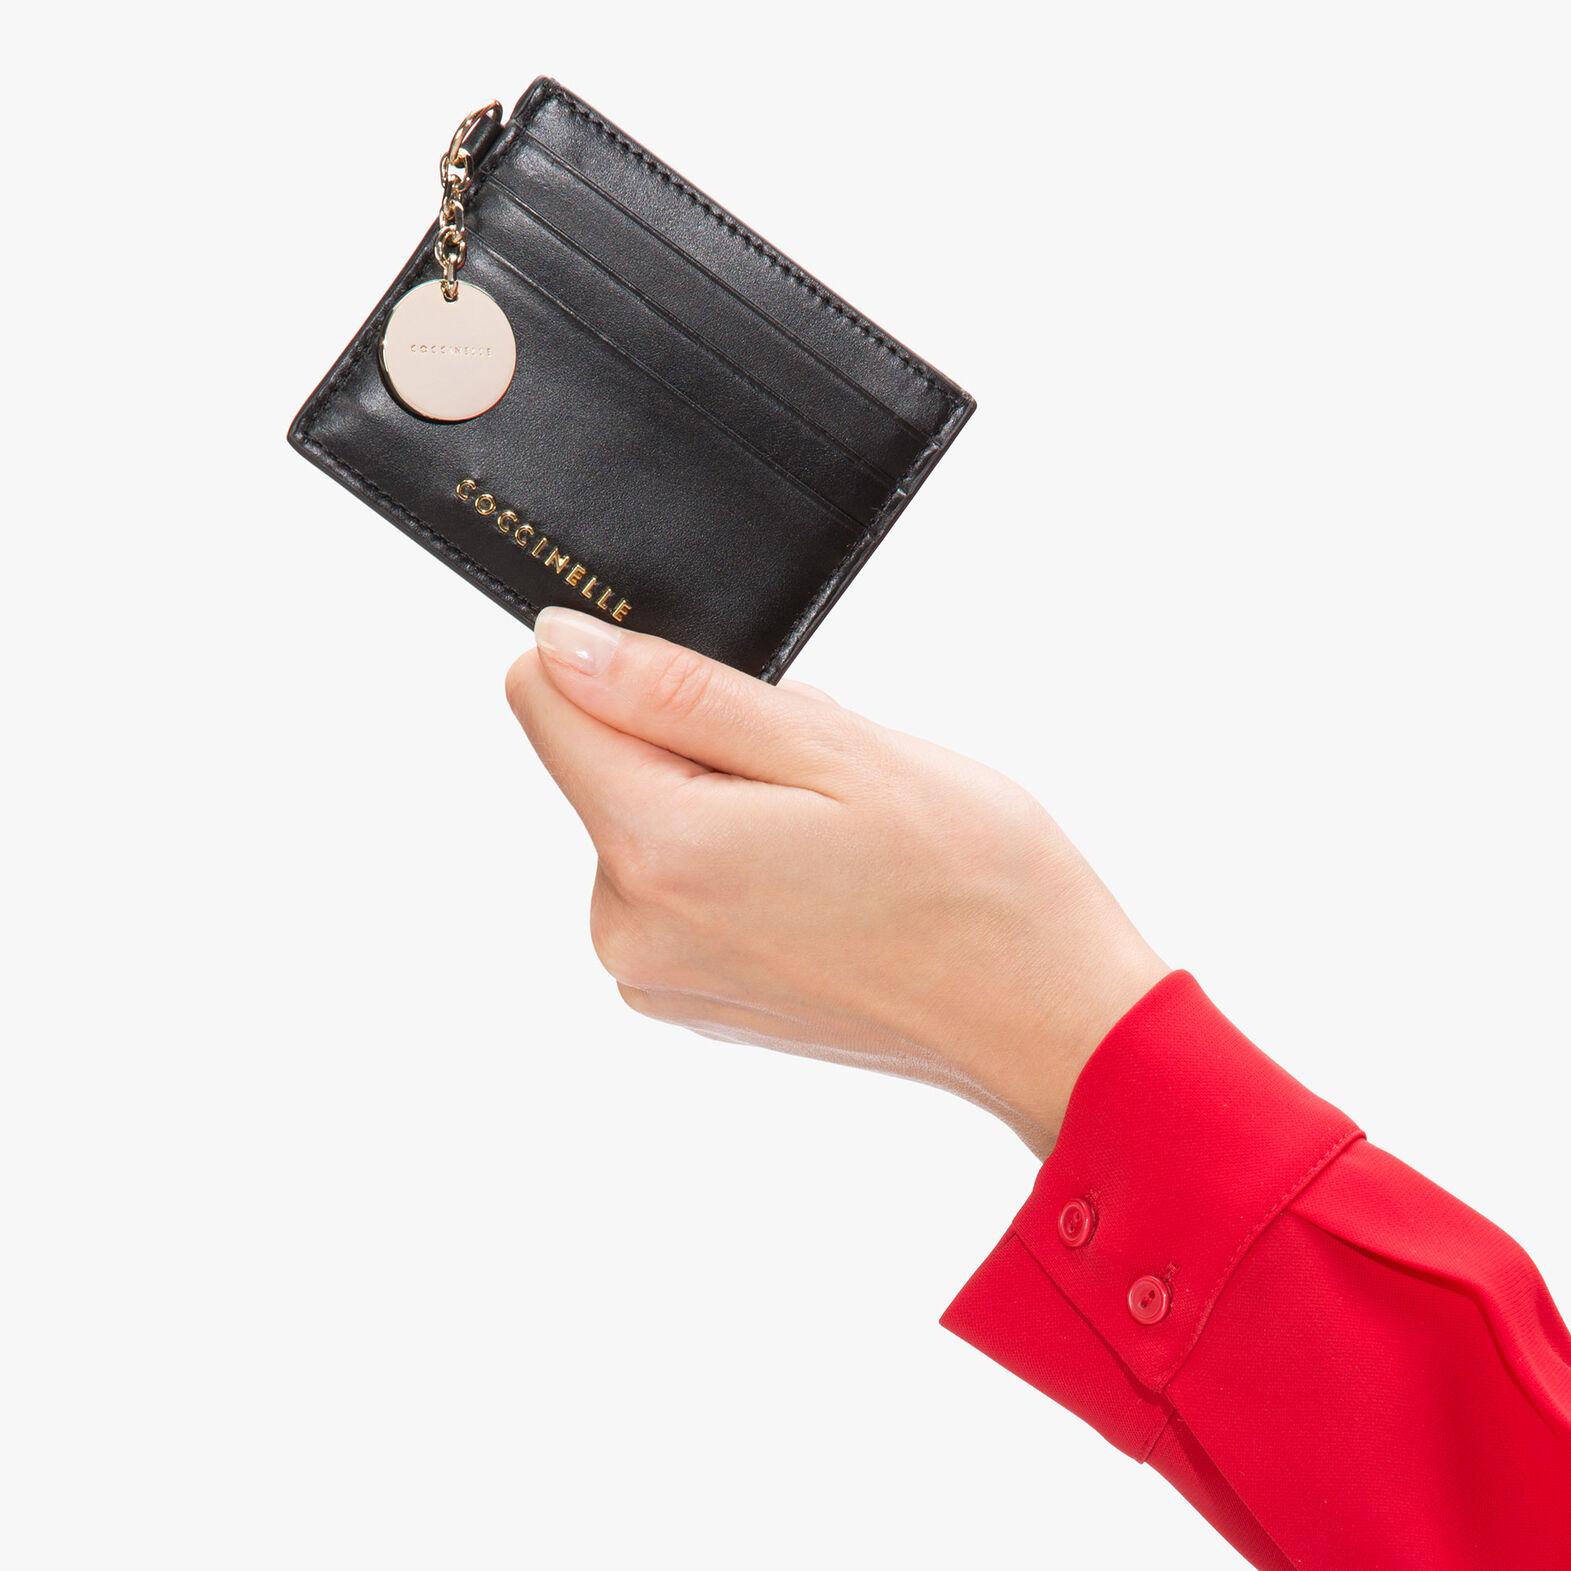 Leather document holder